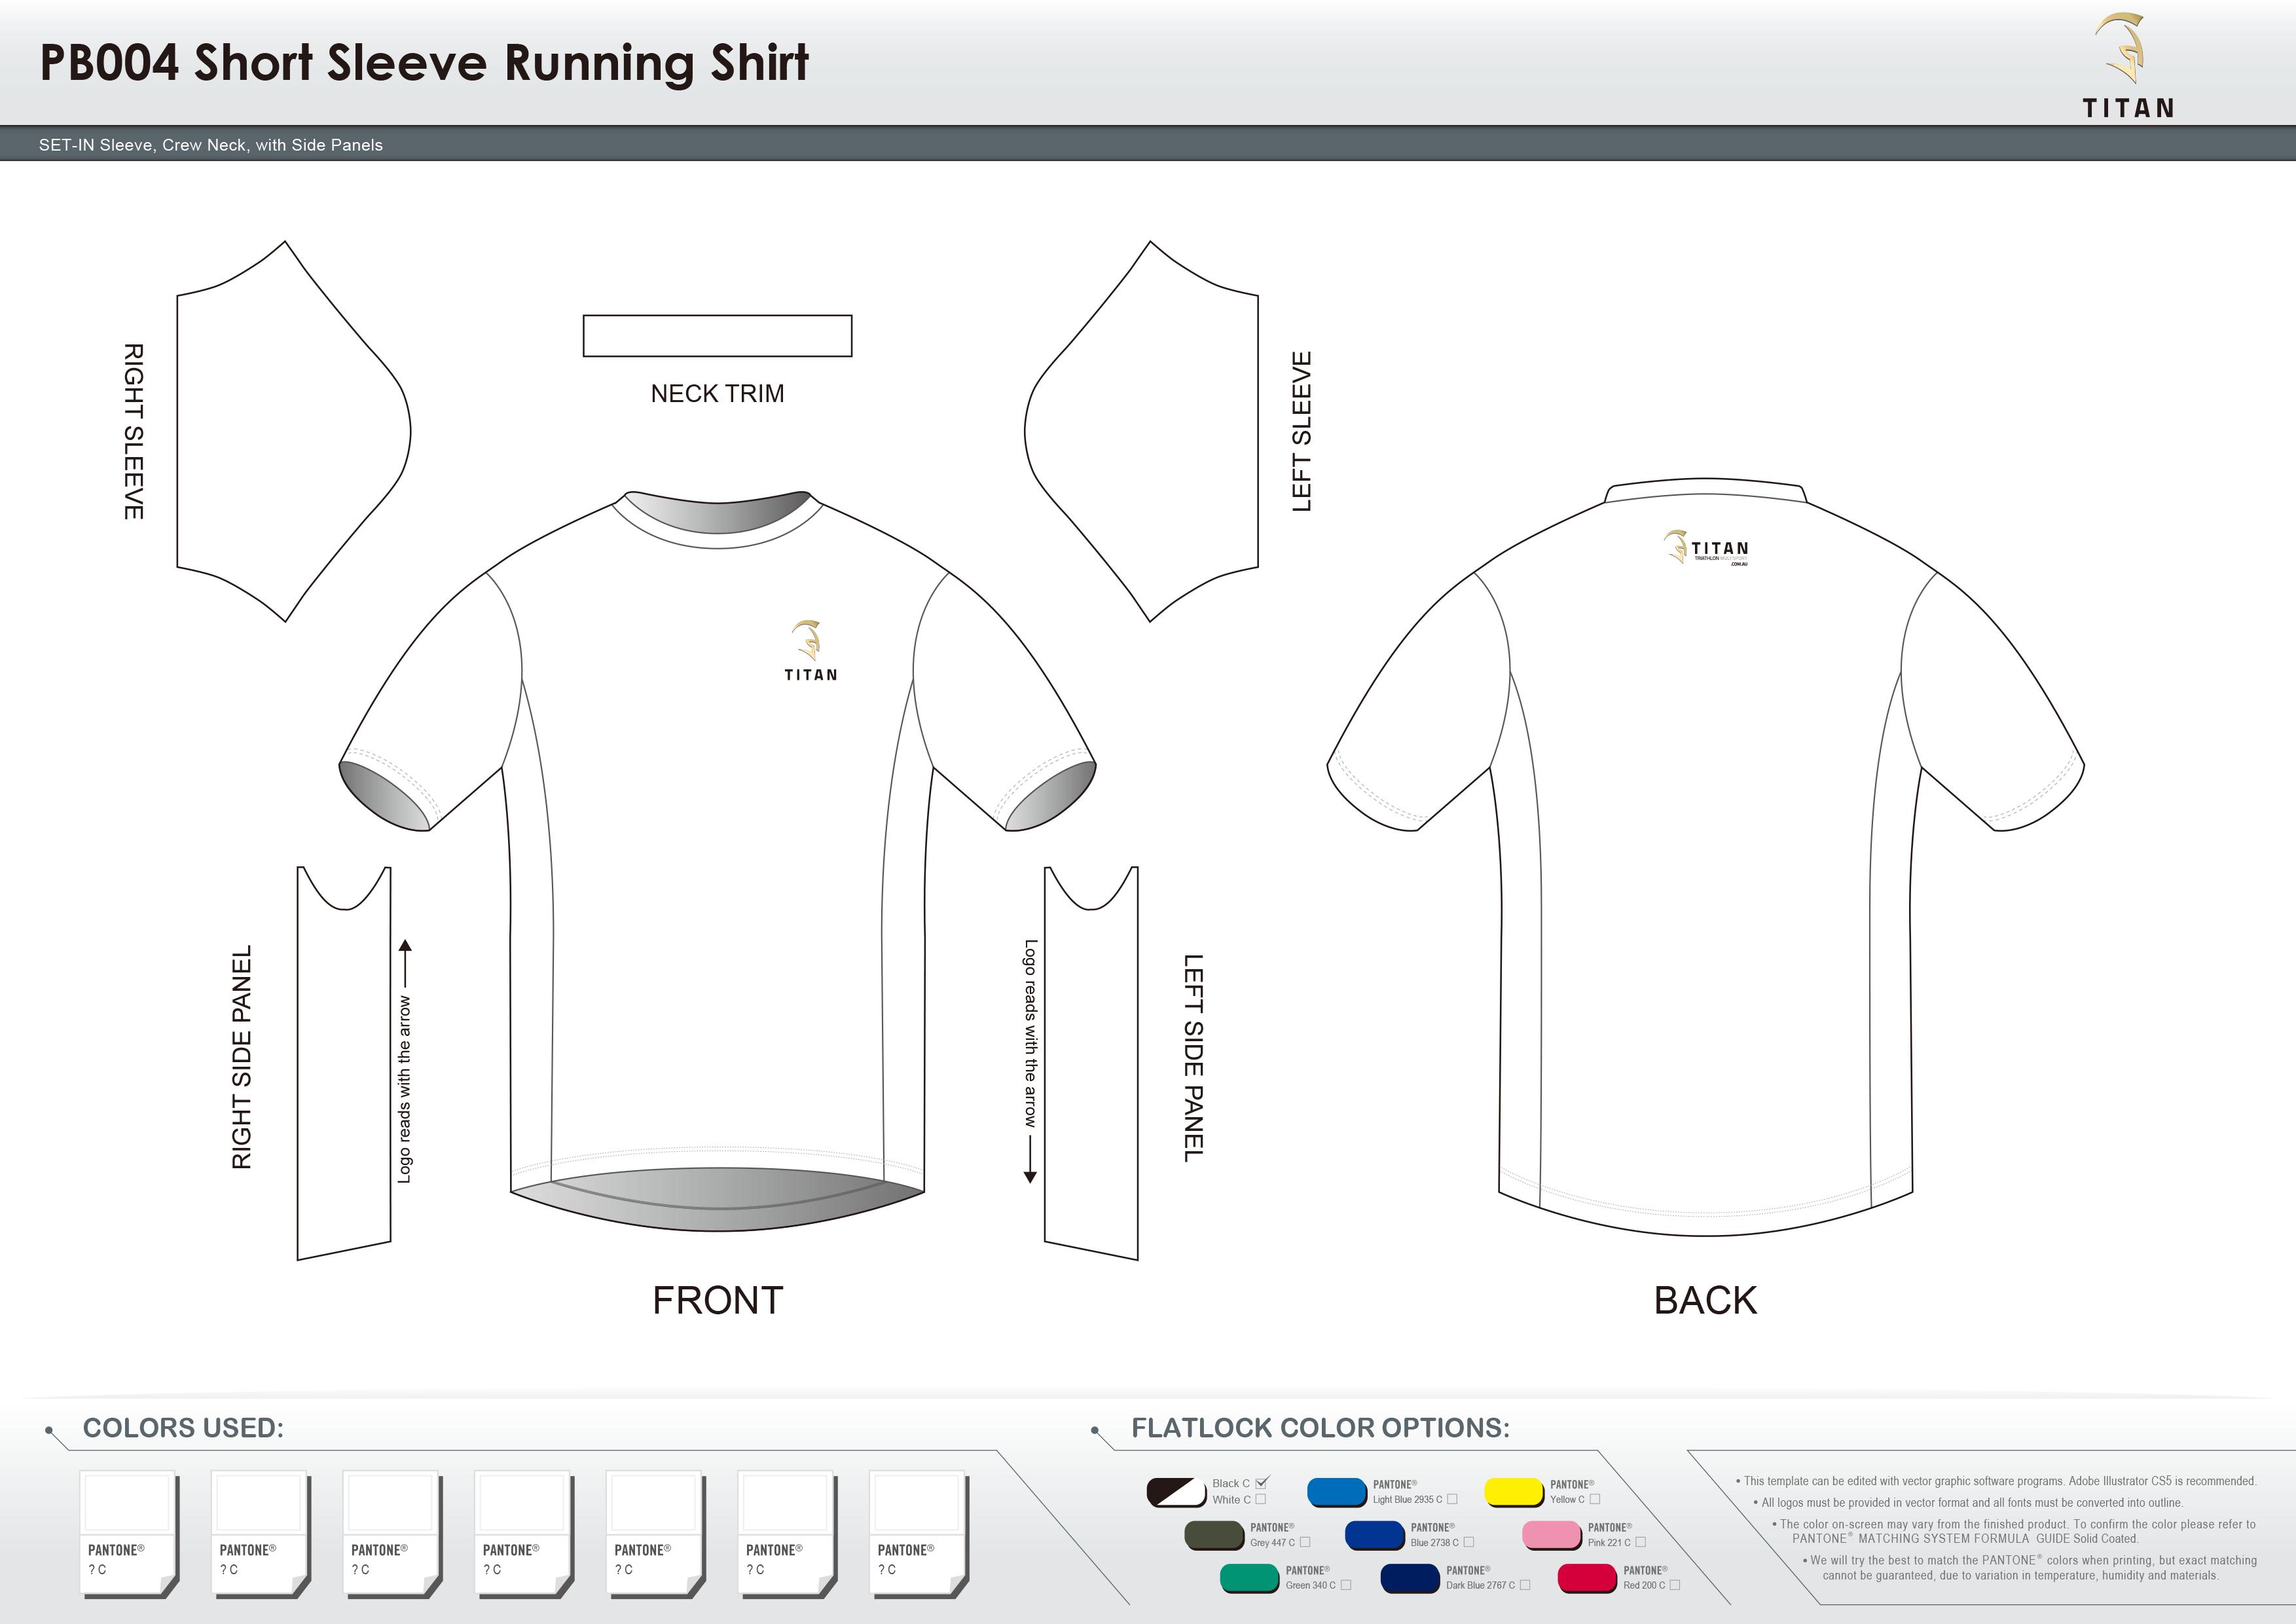 PB004 Short Sleeve Running Shirt